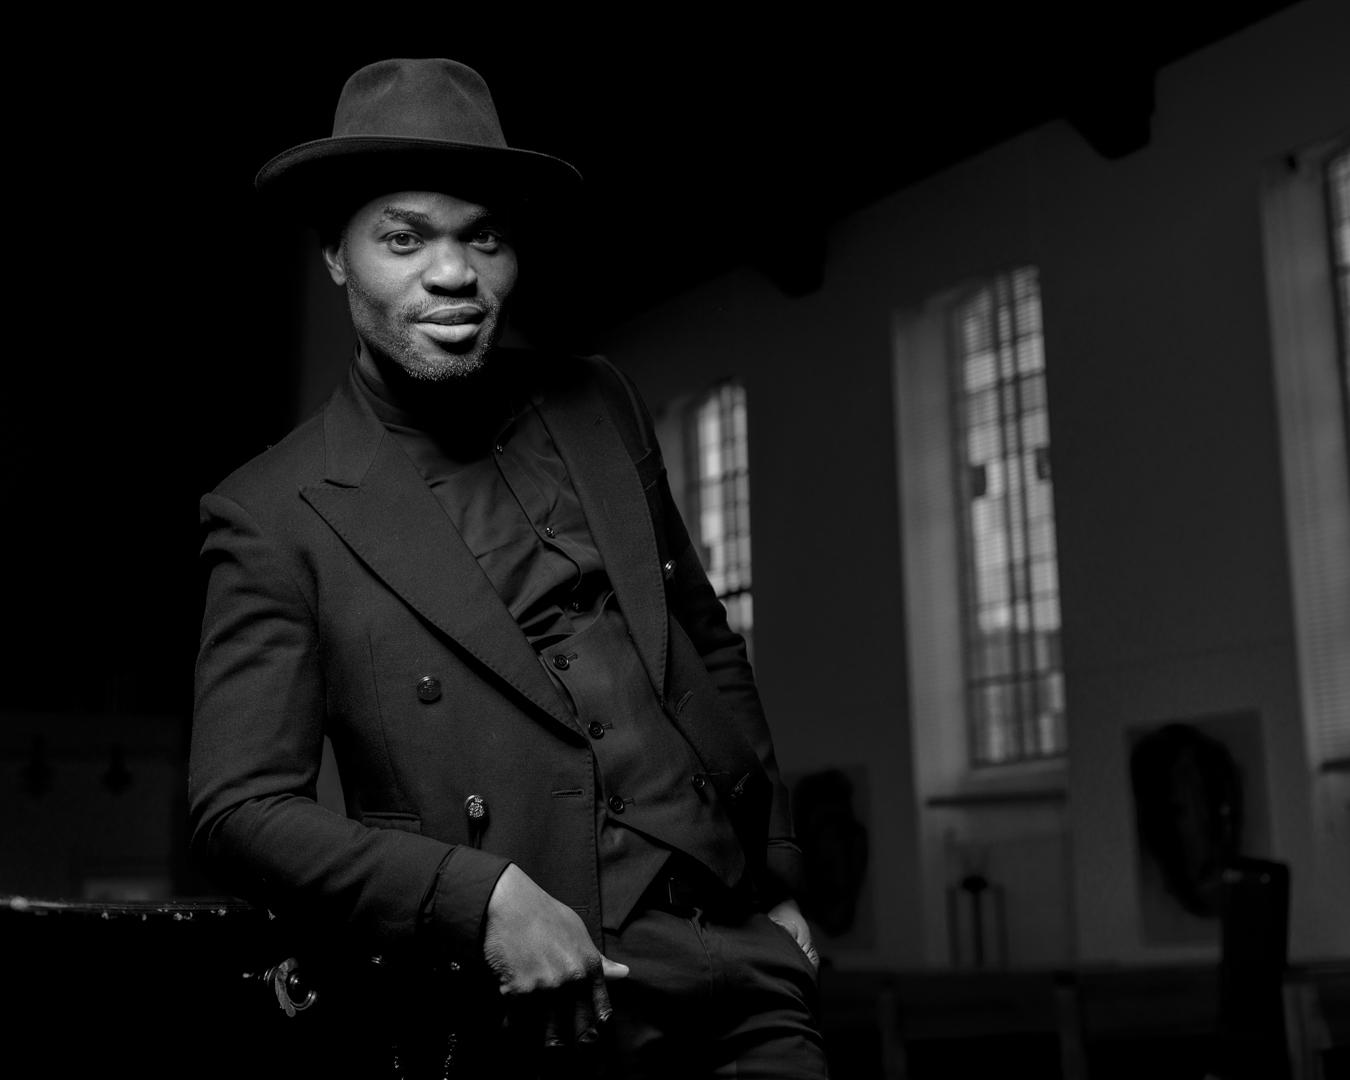 foto: ©Ferry Knijn - zwarte man in pak in gebouw met hoge ramen